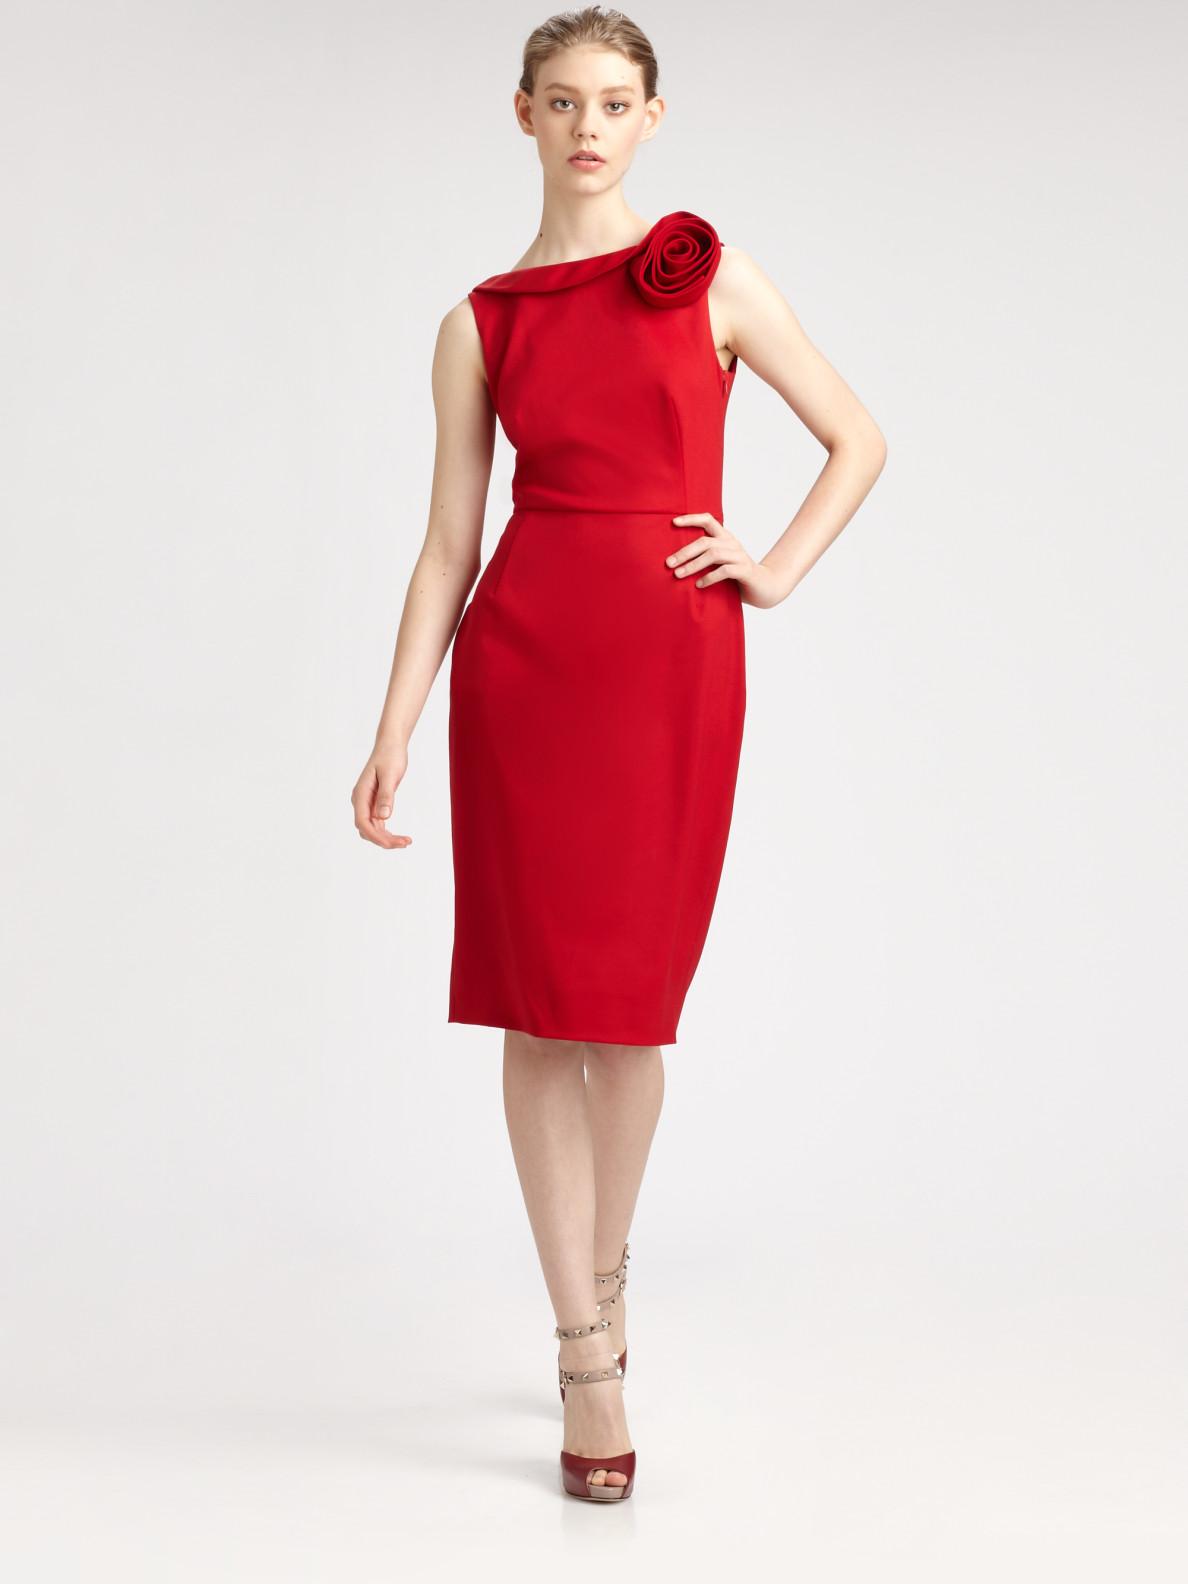 Valentino Rose Shoulder Dress In Red Lyst